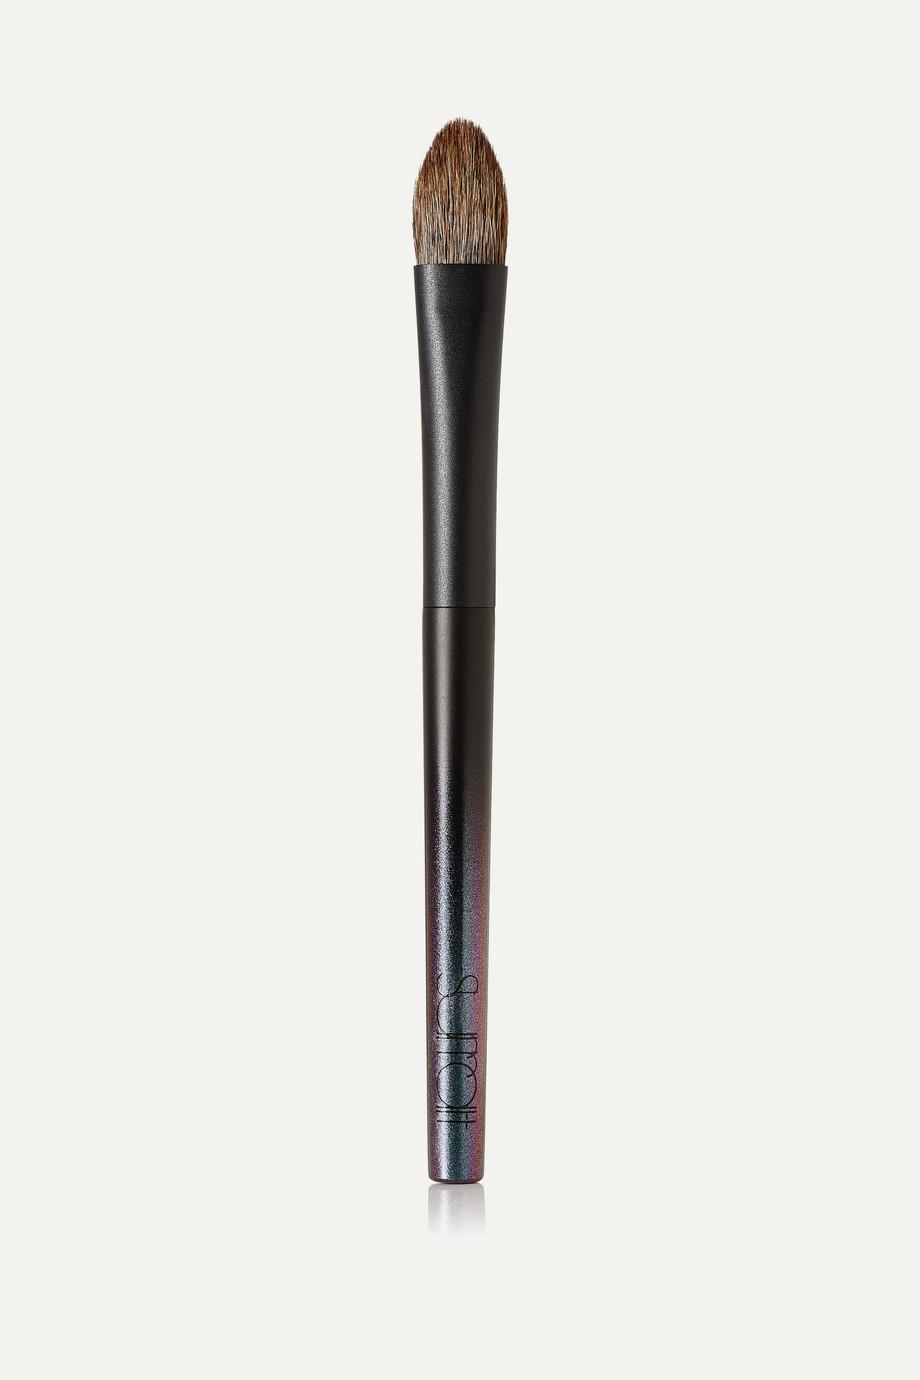 Surratt Beauty Classique Shadow Brush Grande